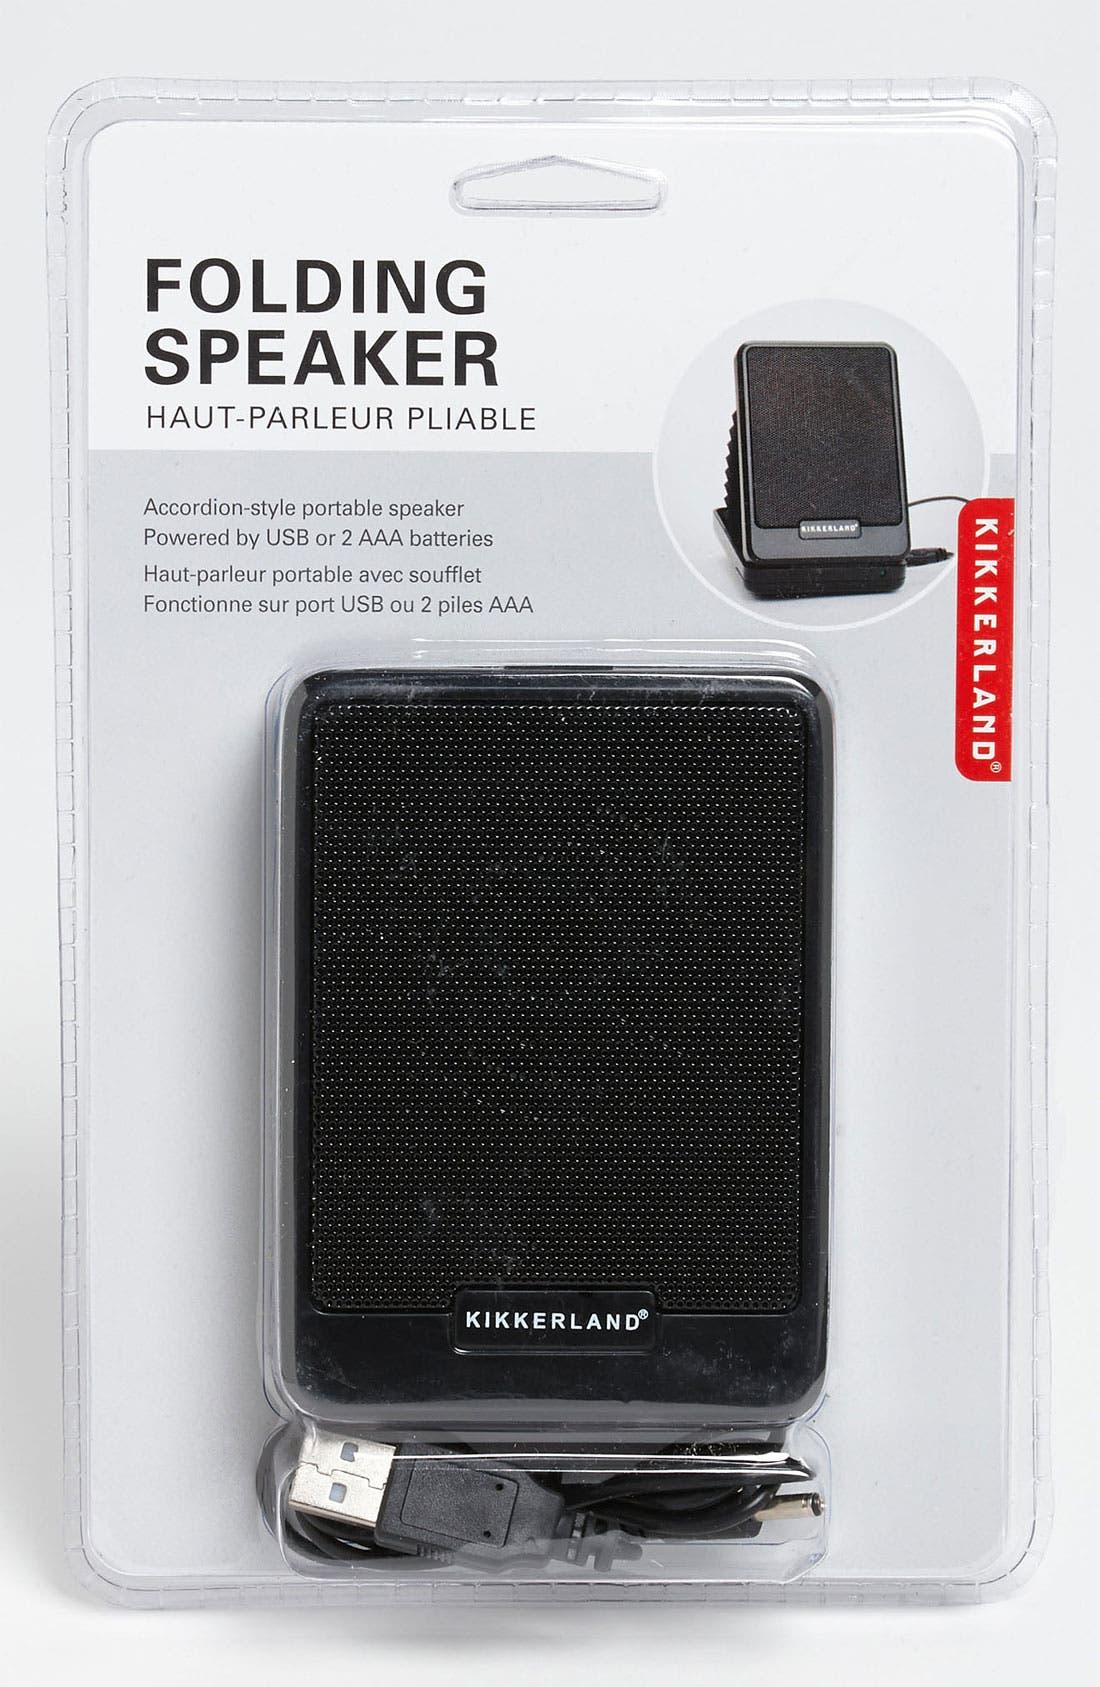 Main Image - Kikkerland Design USB Accordion Speaker